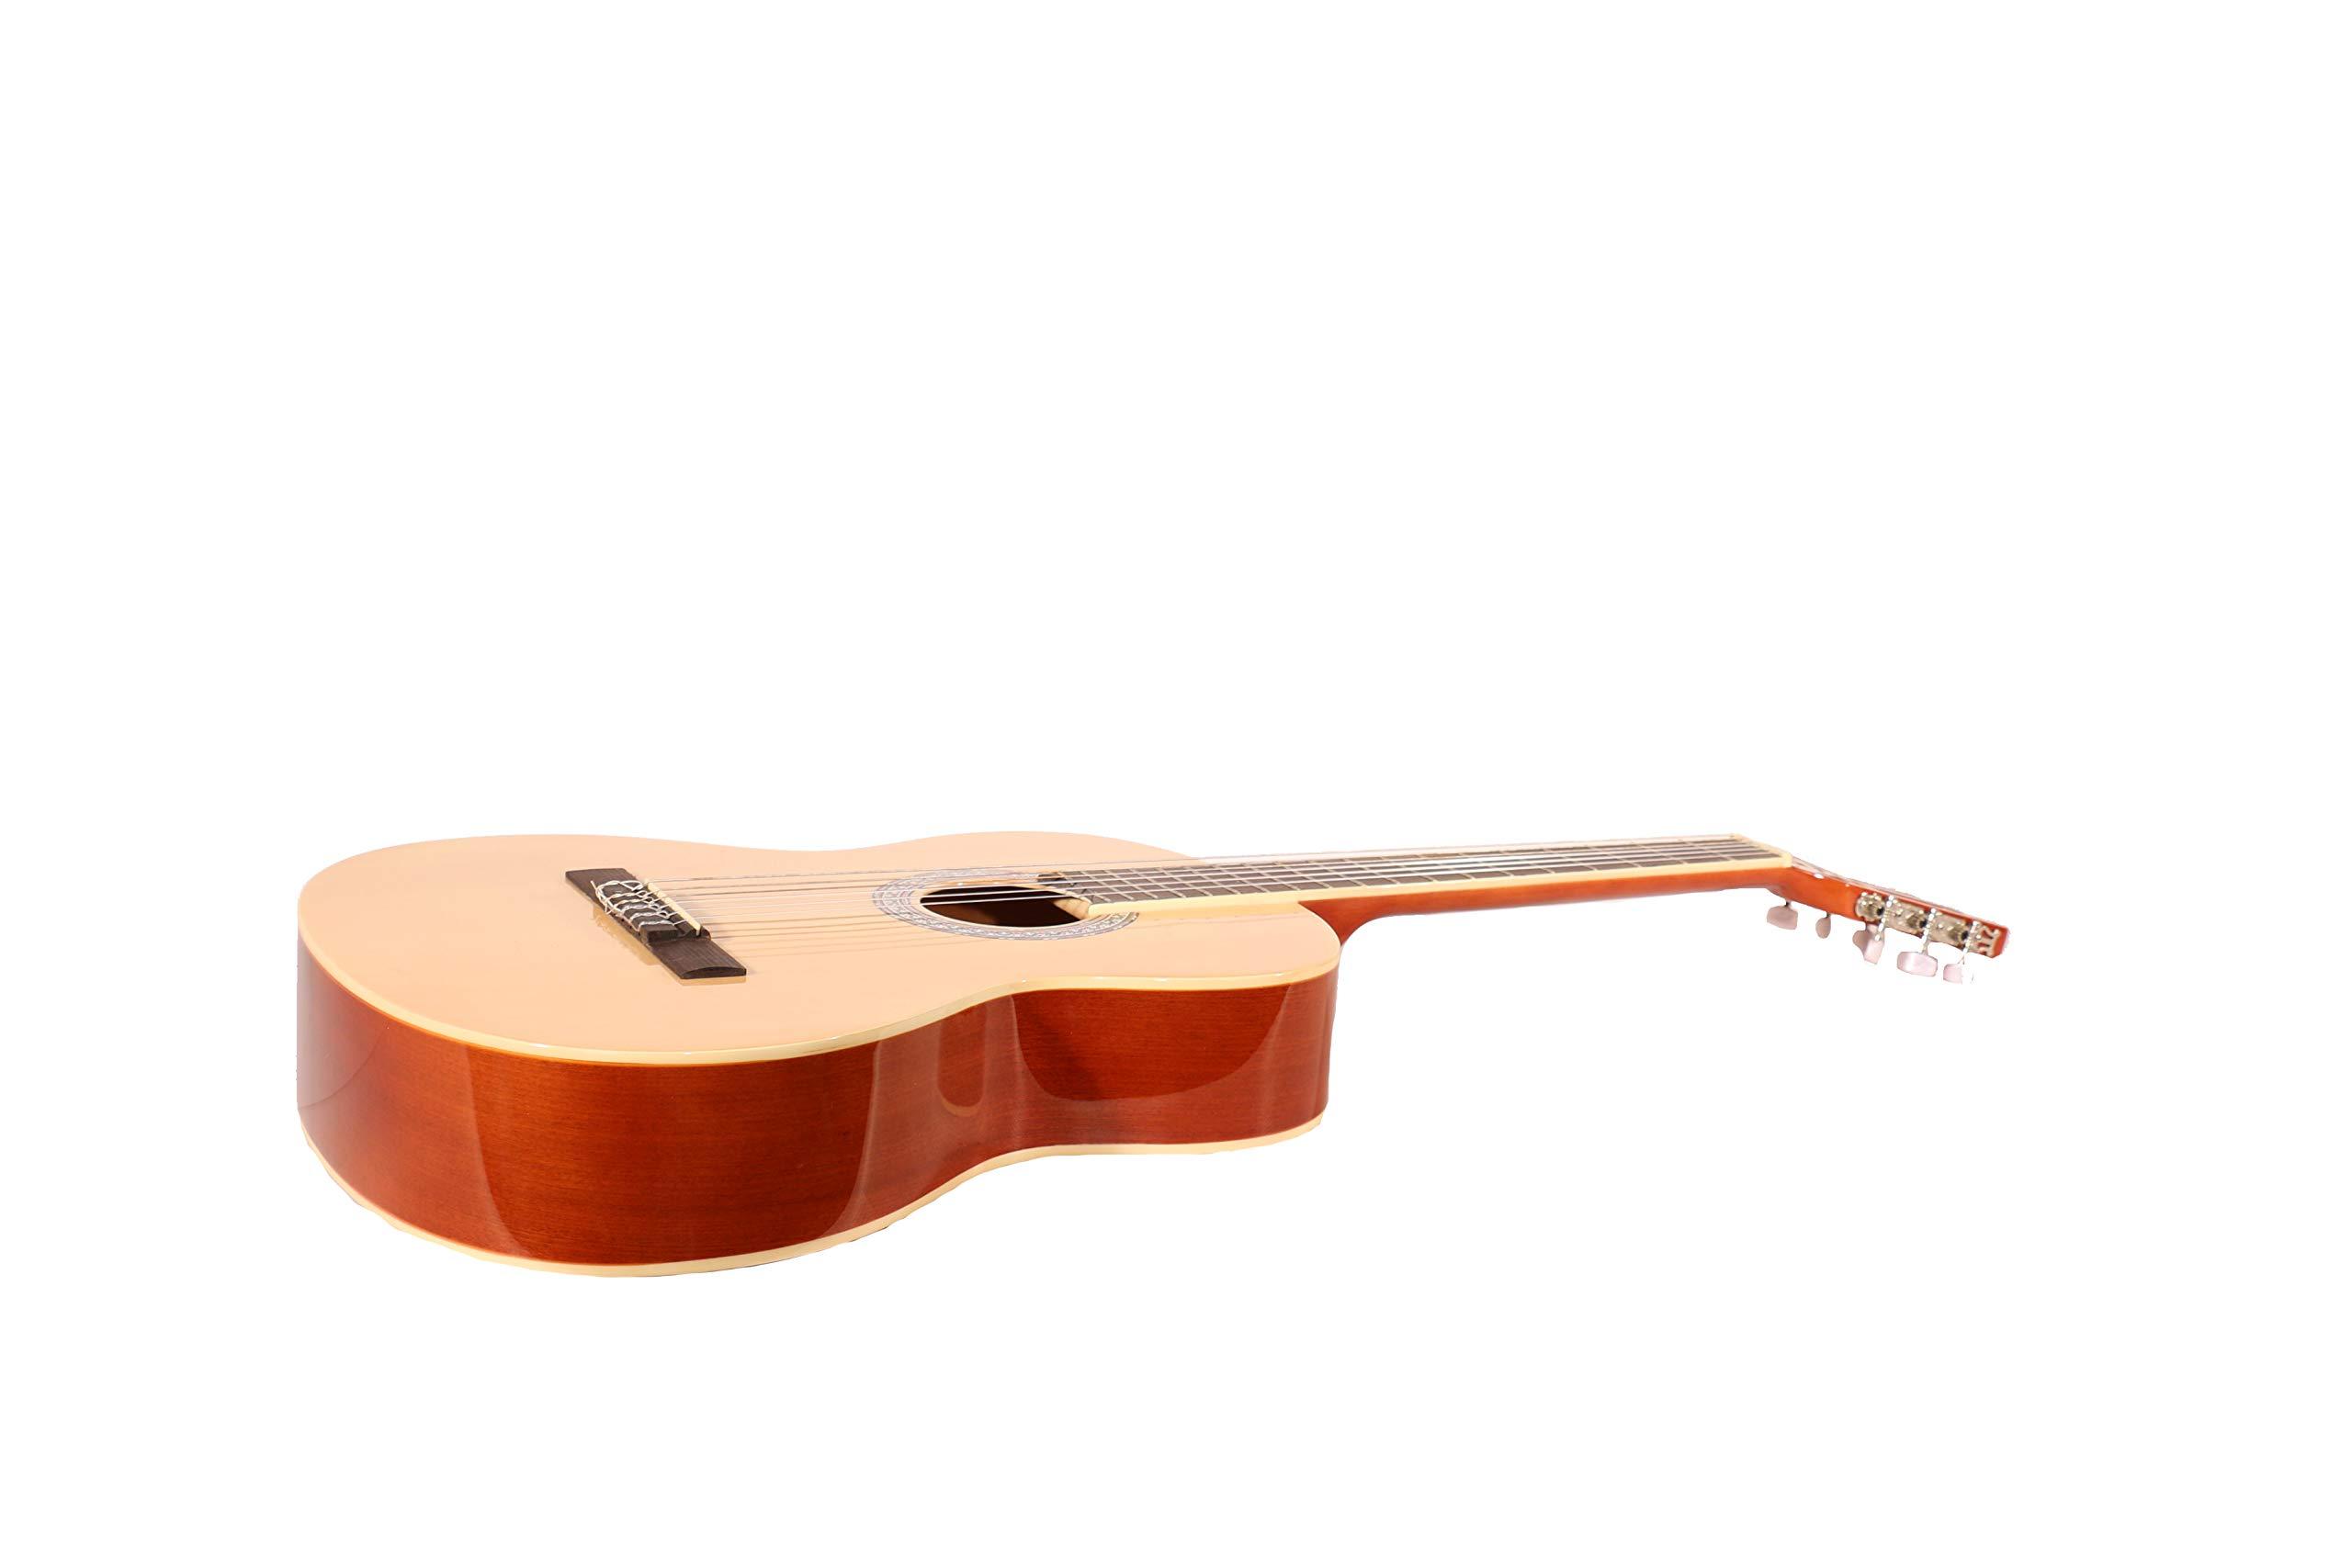 Guitarra clásica ffalstaff modelo C40 con bolsa acolchada, muda de ...